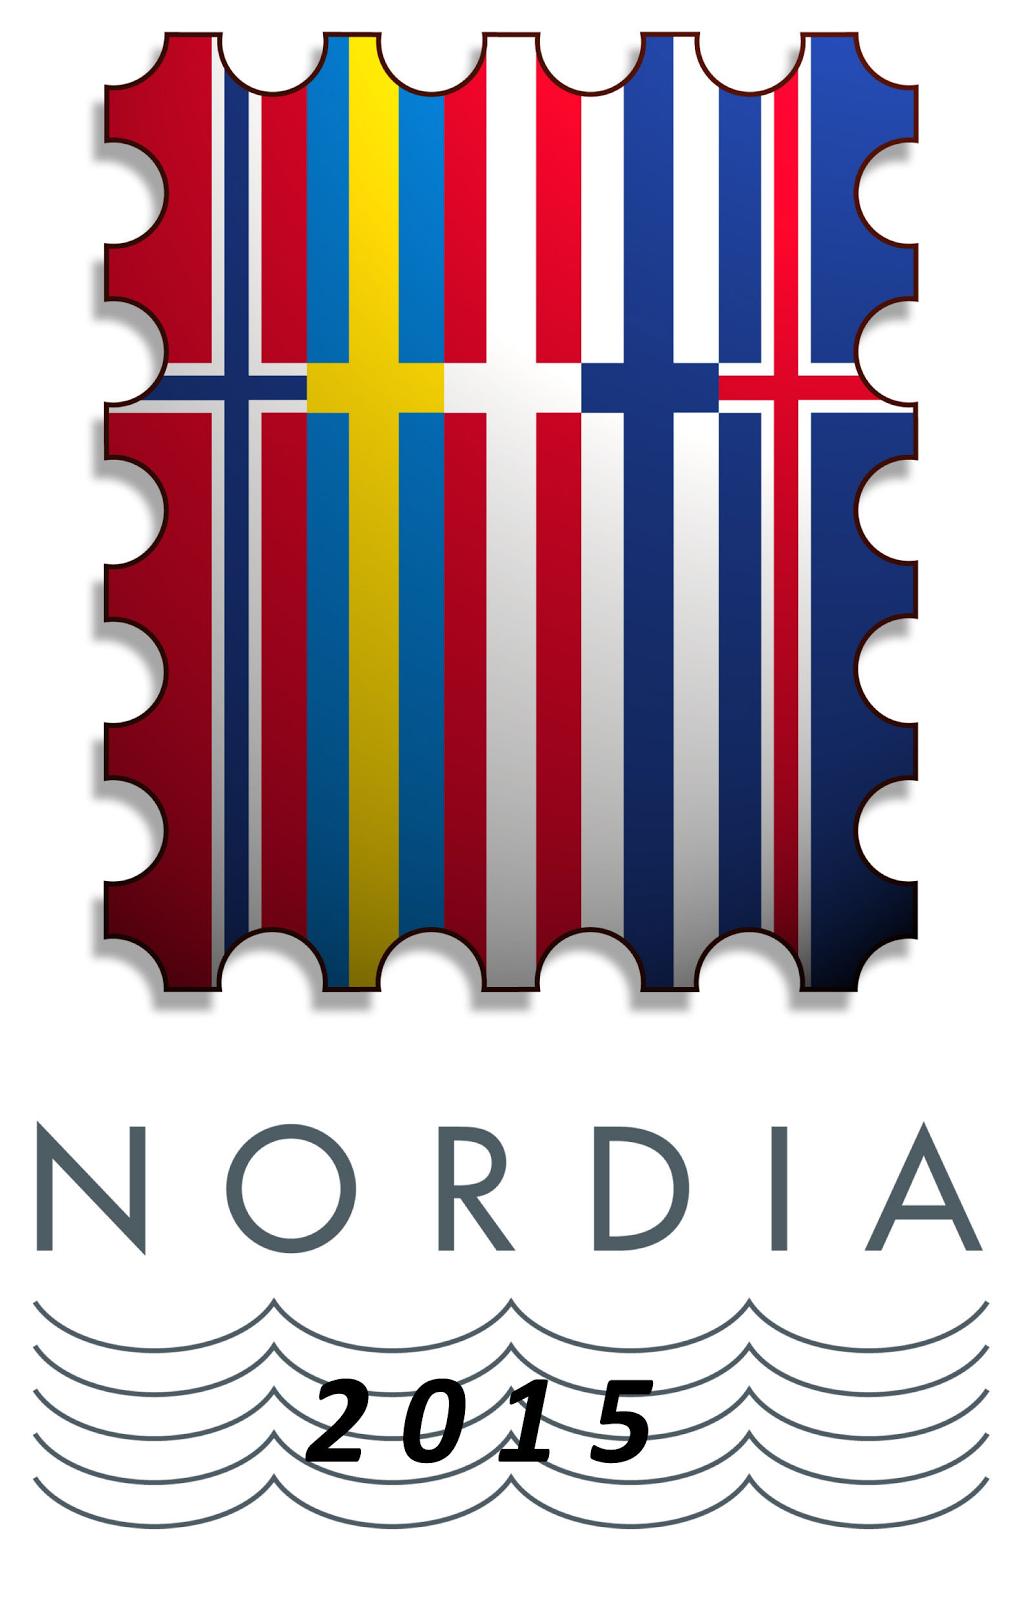 NORDIA 2015